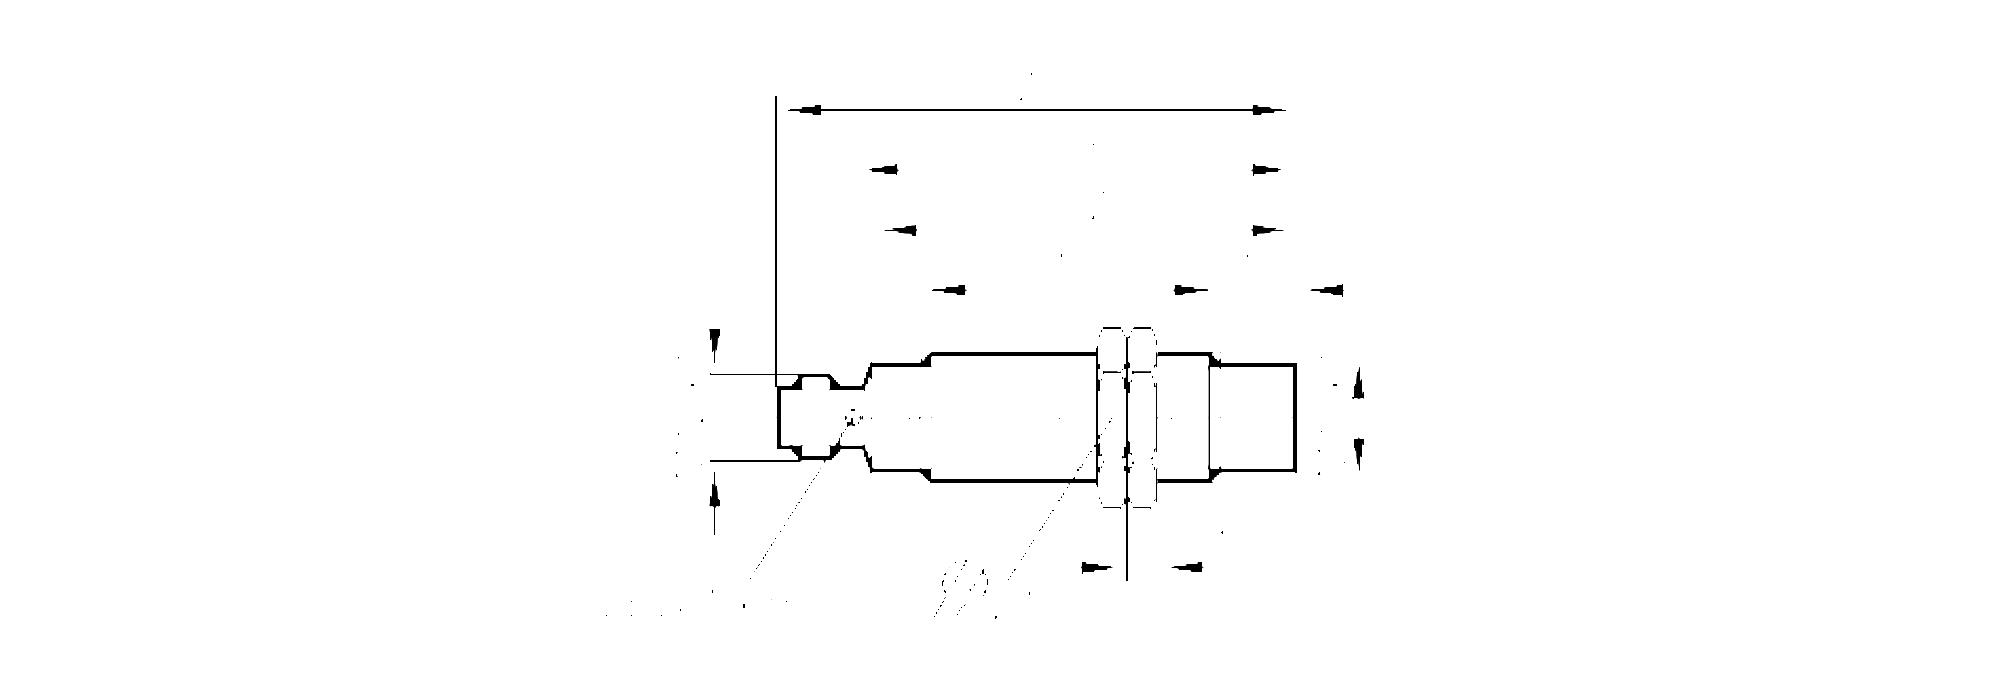 ig6566 - inductive sensor